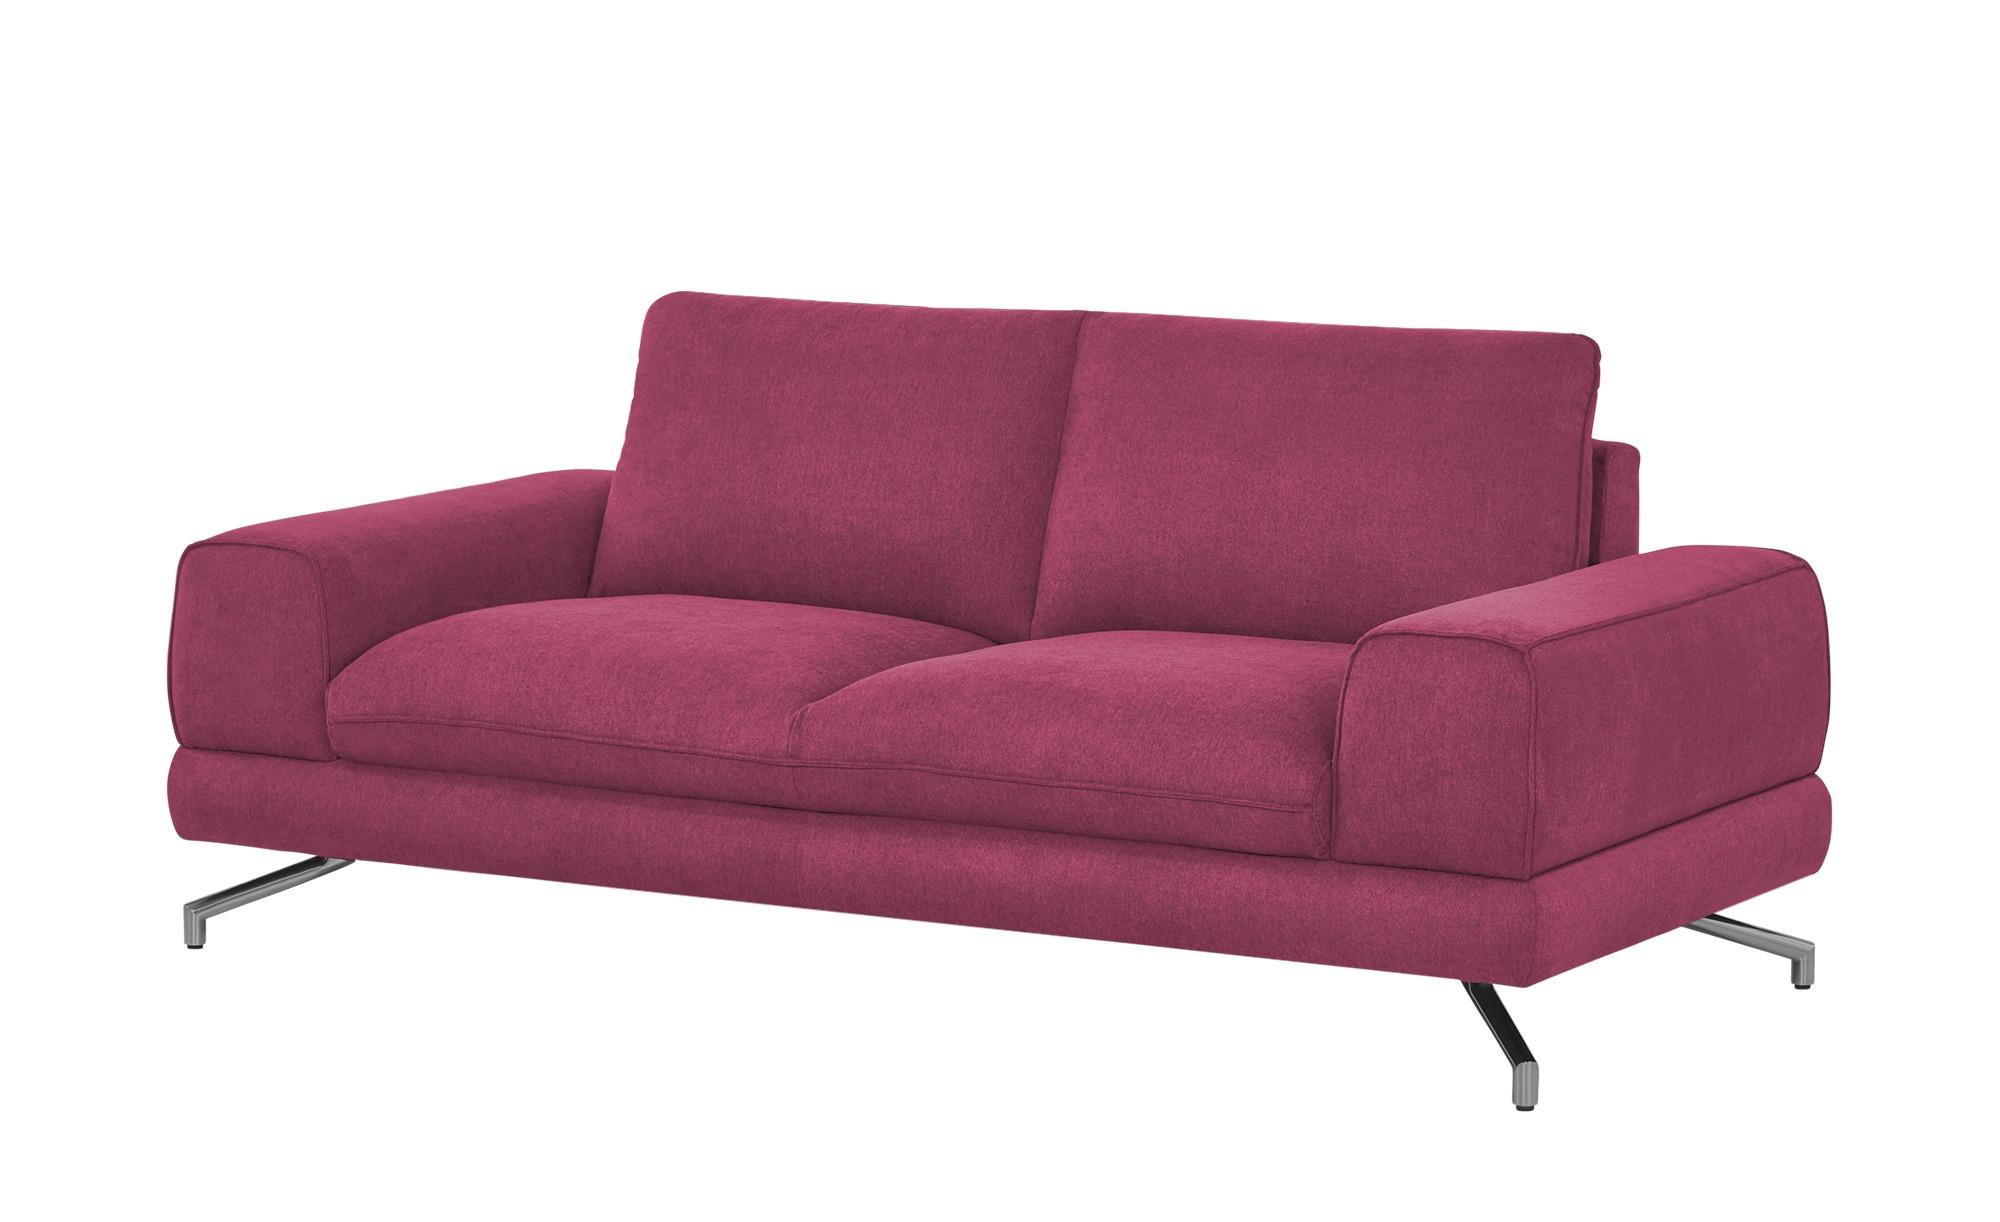 smart Sofa bordeaux - Stoff Bonika ¦ rot ¦ Maße (cm): B: 198 H: 83 T: 95 Polstermöbel > Sofas > Einzelsofas - Höffner